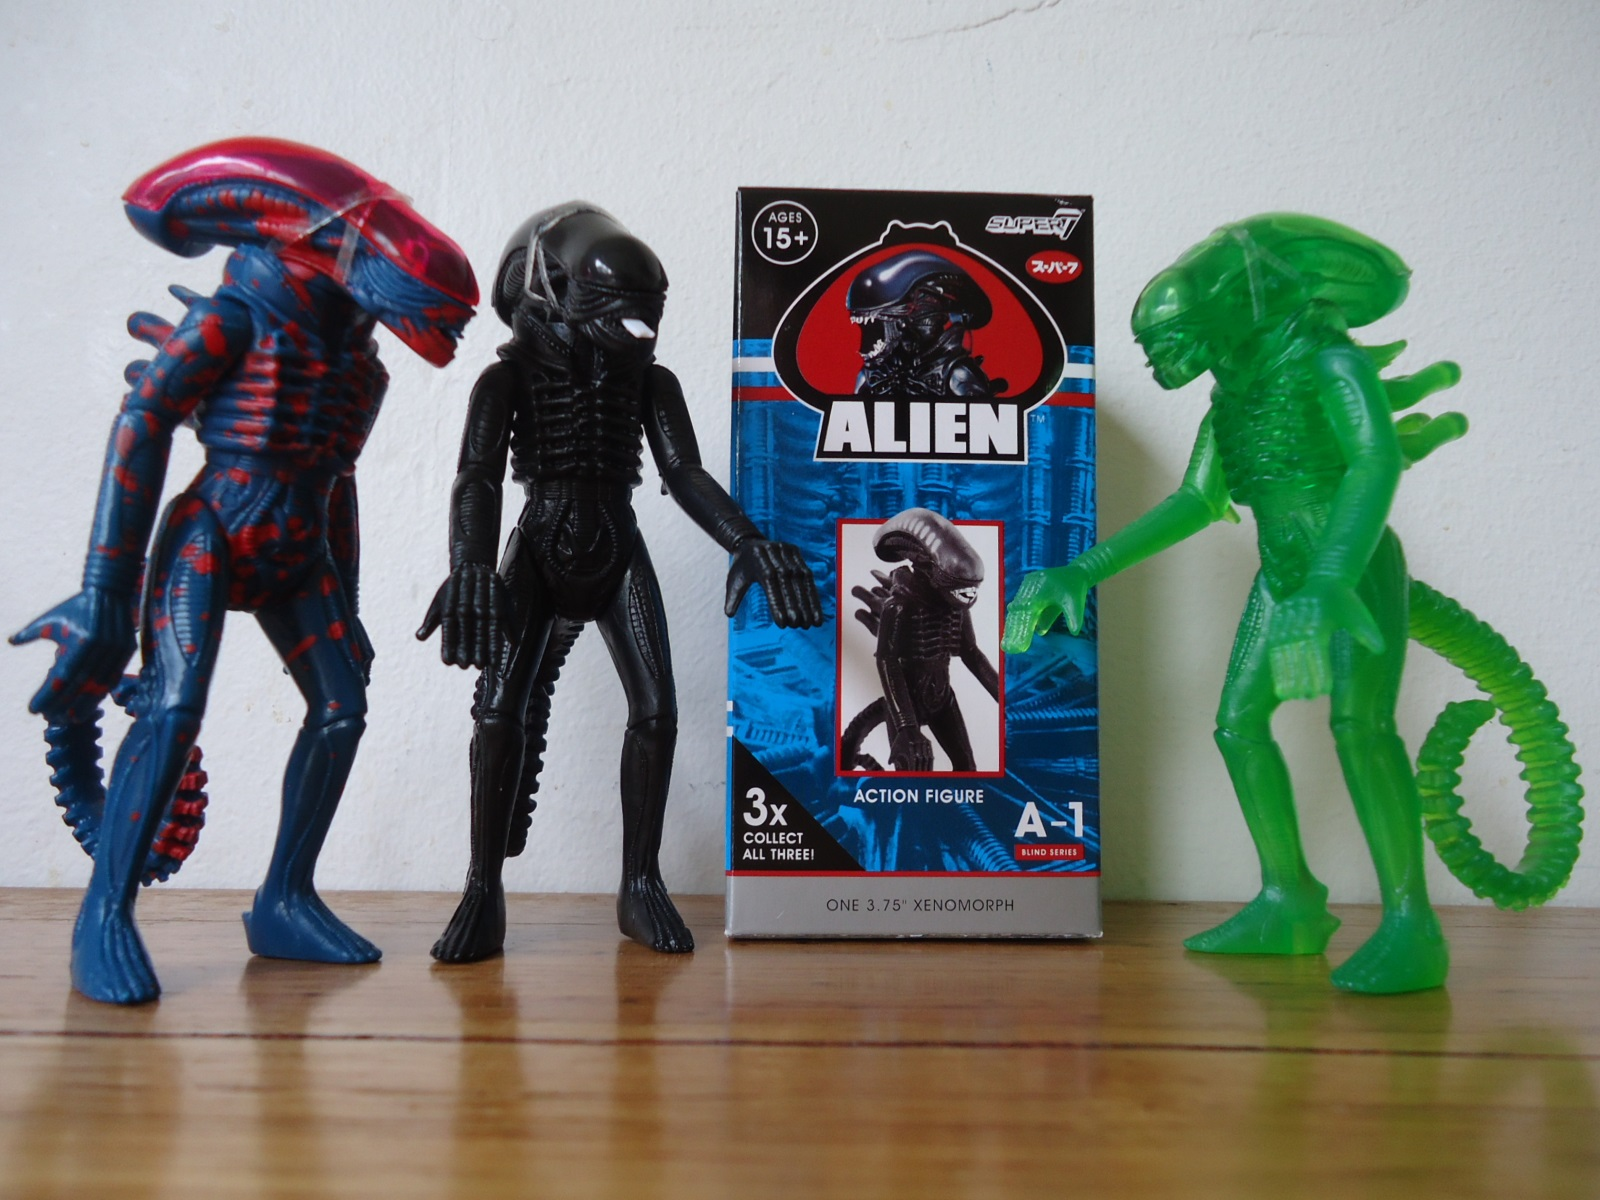 Alien Space Villian Super 7 ReAction 1 blind box Figure New Sealed A3